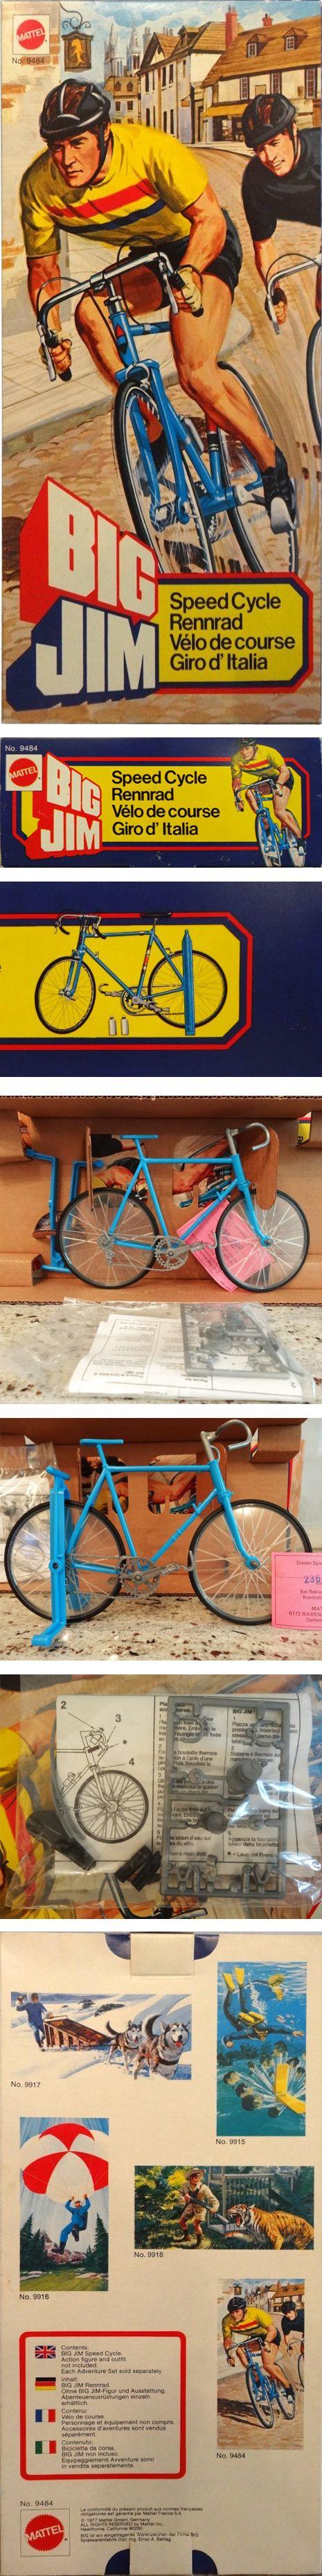 Big Jim / Speed cycle, Vélo de Course, Giro d'Italia (ref. 9484) by Mattel